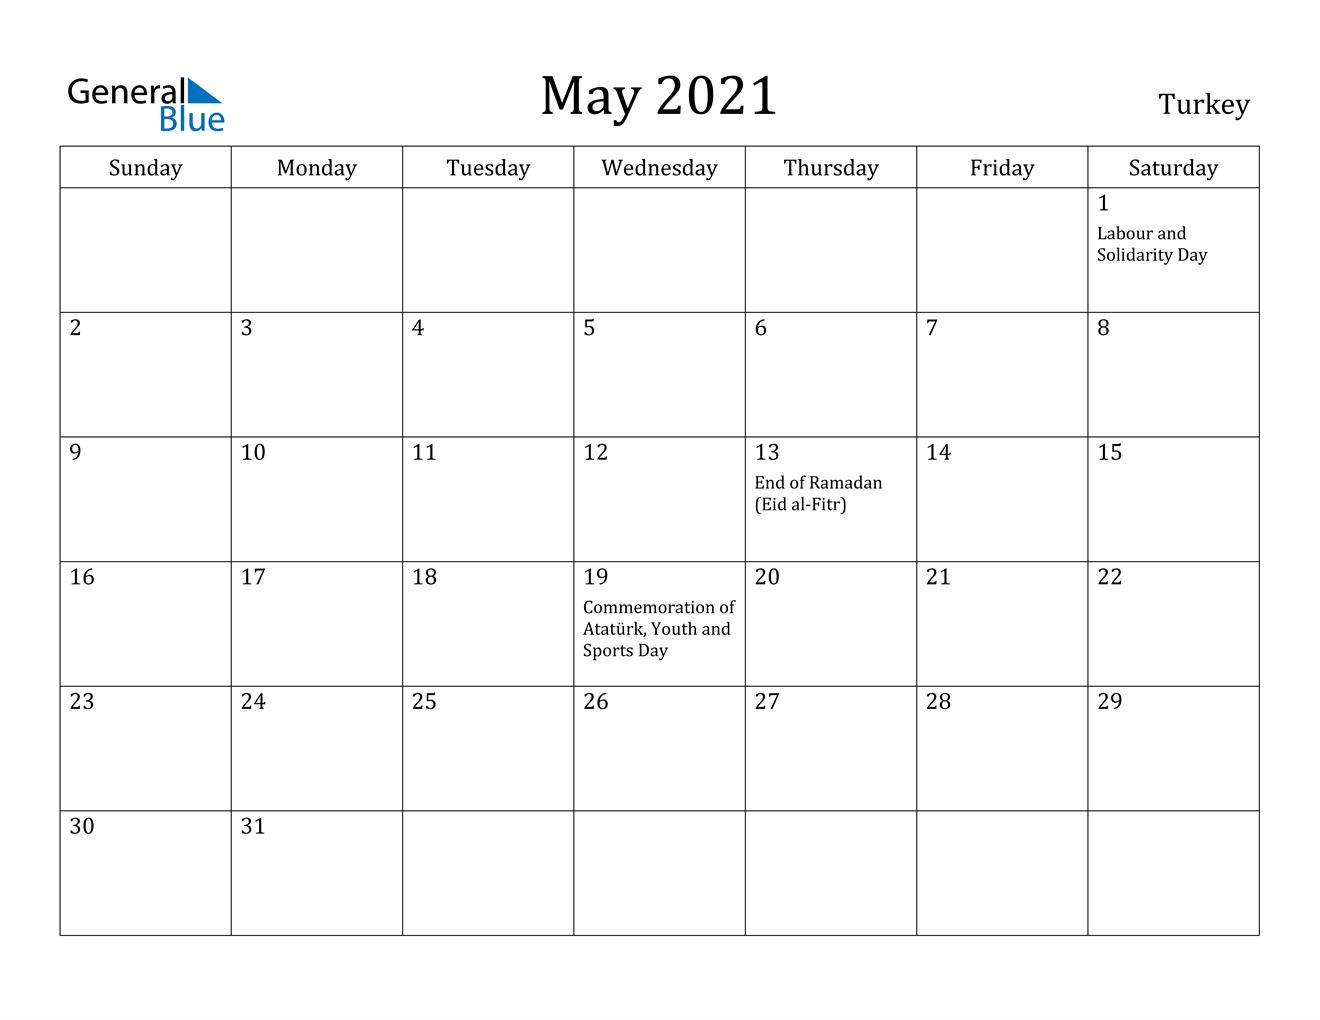 May 2021 Calendar - Turkey